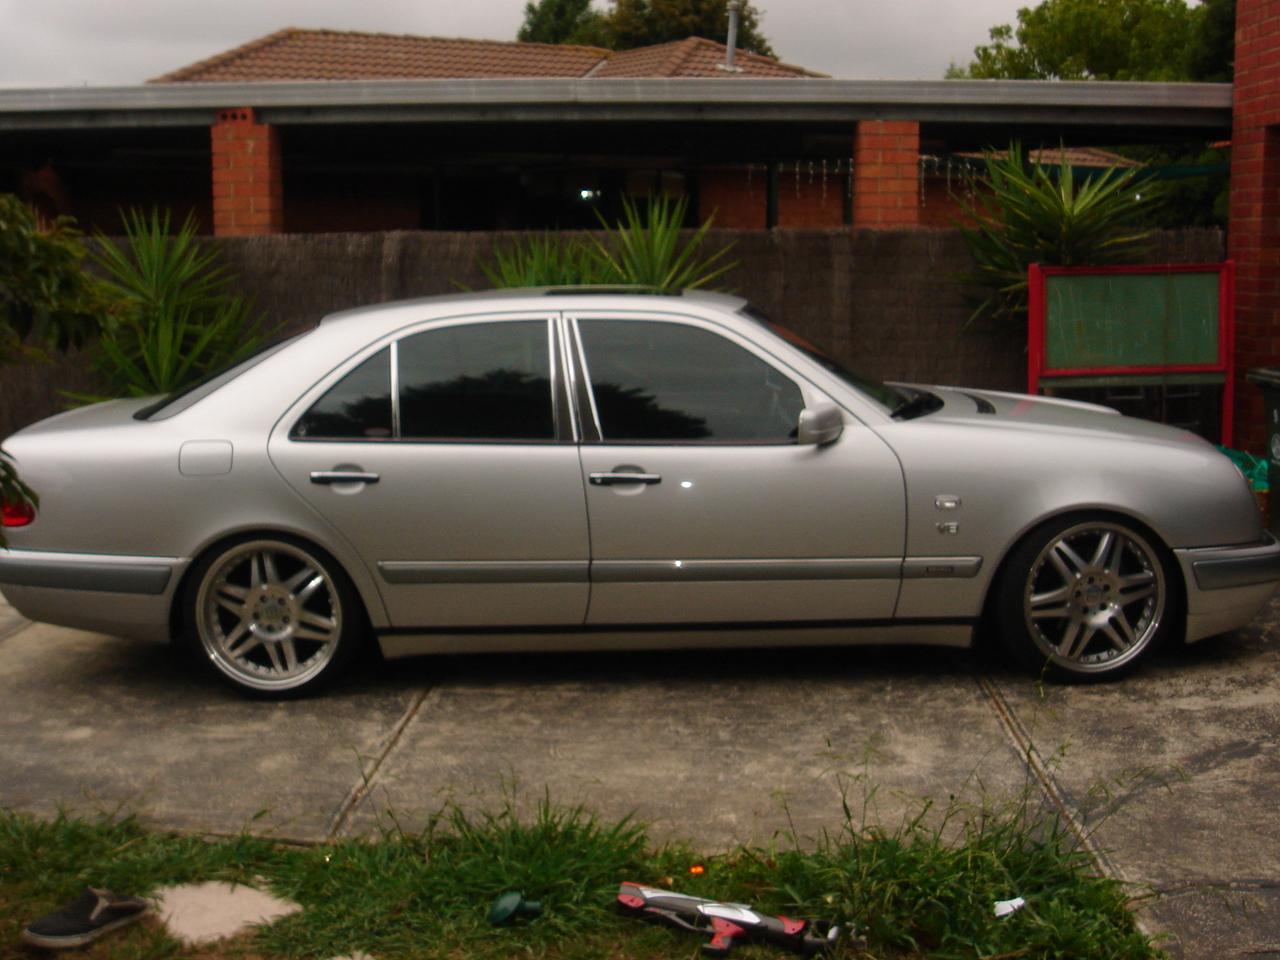 1998 Mercedes-benz E-class - Pictures